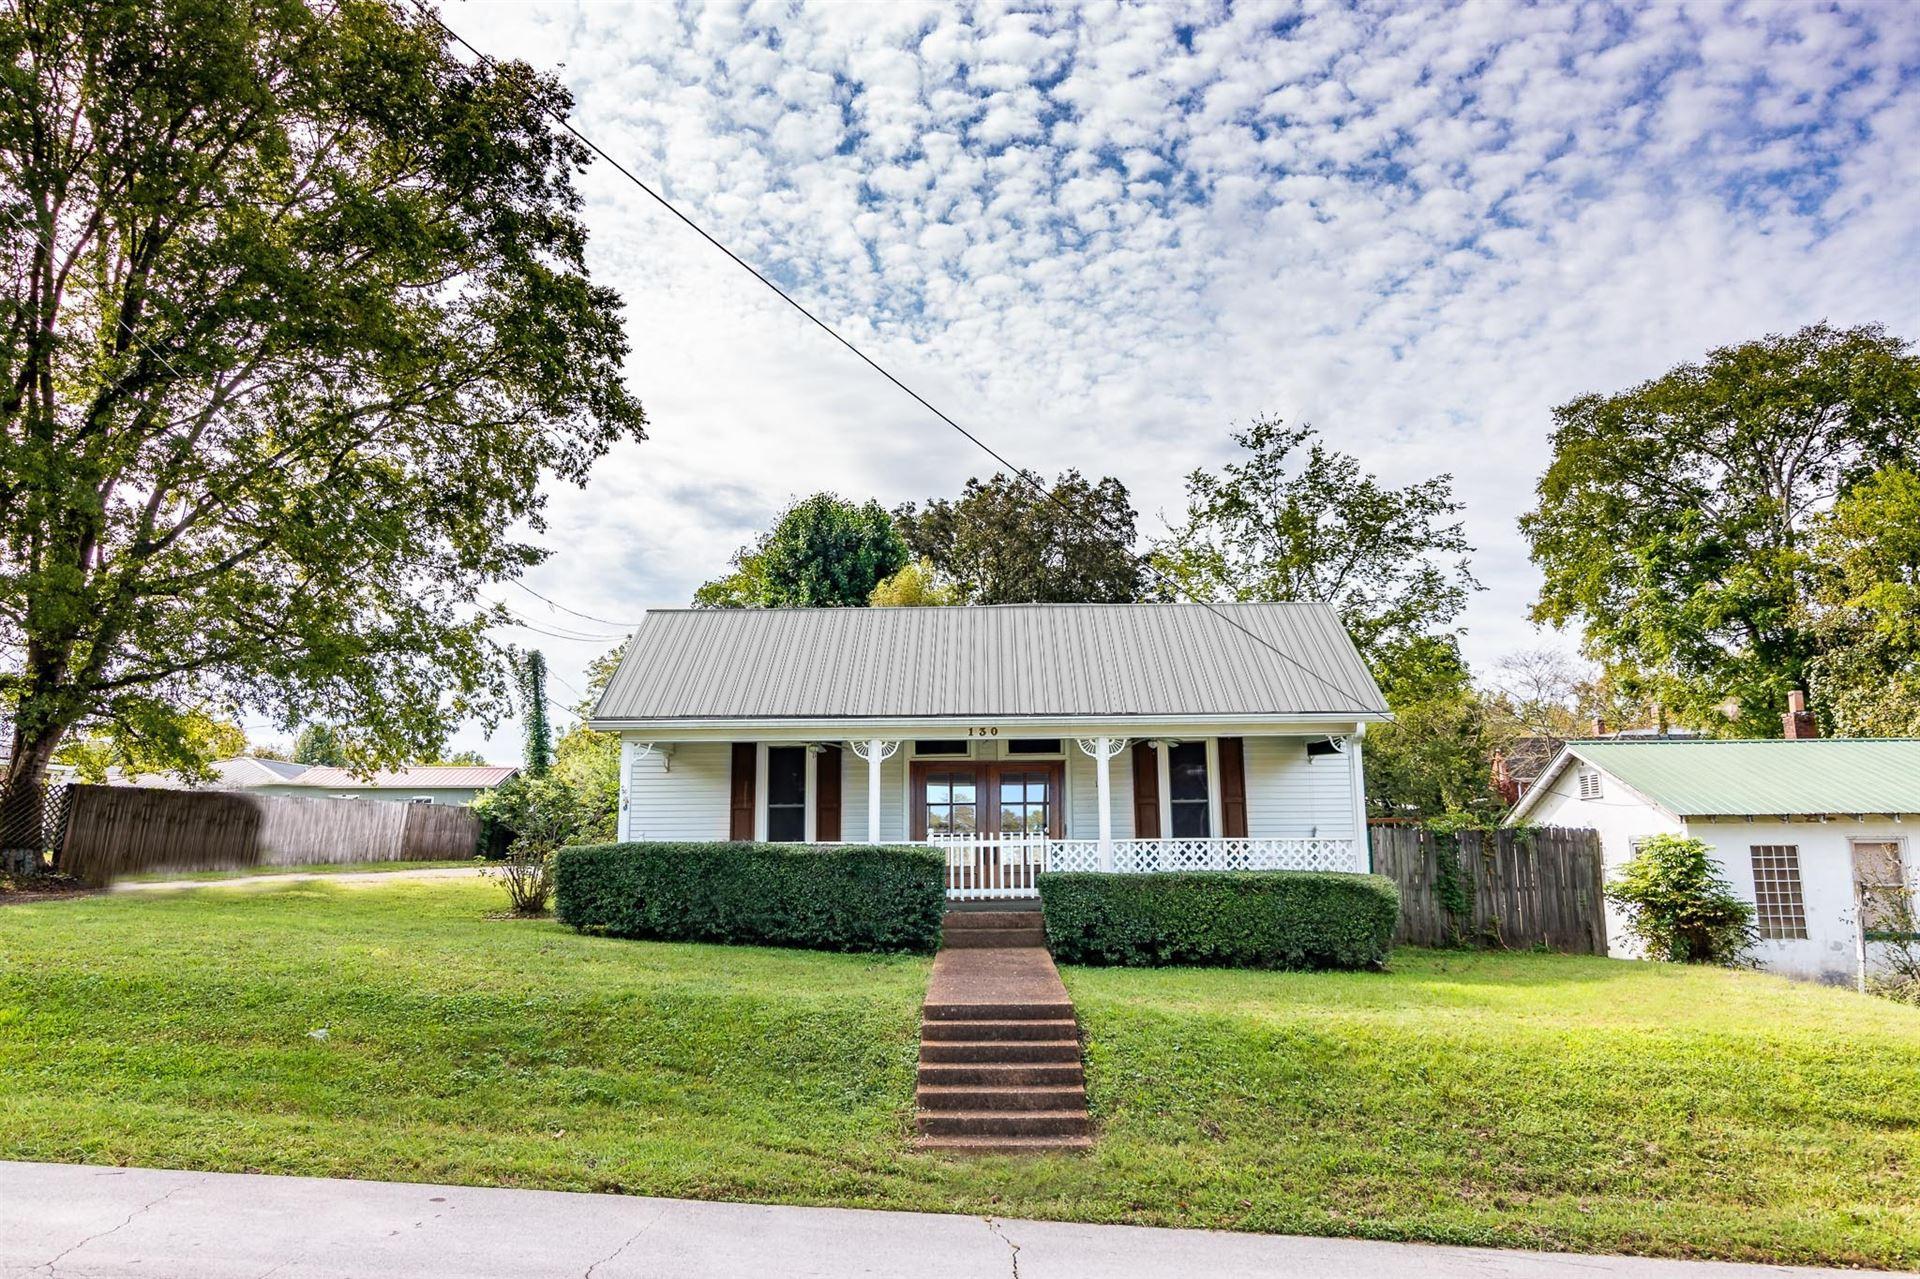 130 Church St, Centerville, TN 37033 - MLS#: 2190144